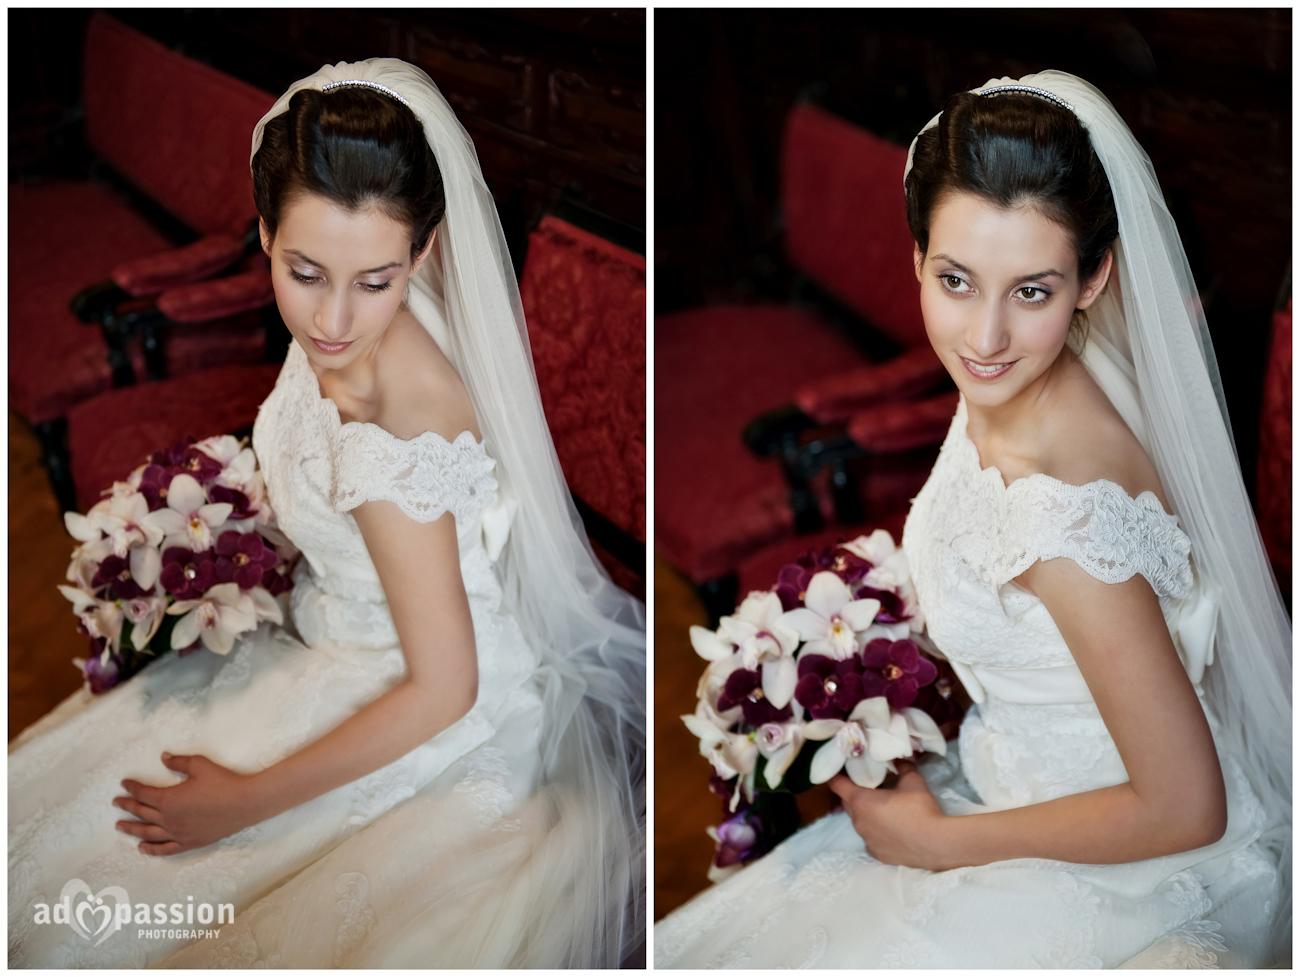 AD Passion Photography | 2011-05-22-Miriam&Florin_20 | Adelin, Dida, fotograf profesionist, fotograf de nunta, fotografie de nunta, fotograf Timisoara, fotograf Craiova, fotograf Bucuresti, fotograf Arad, nunta Timisoara, nunta Arad, nunta Bucuresti, nunta Craiova